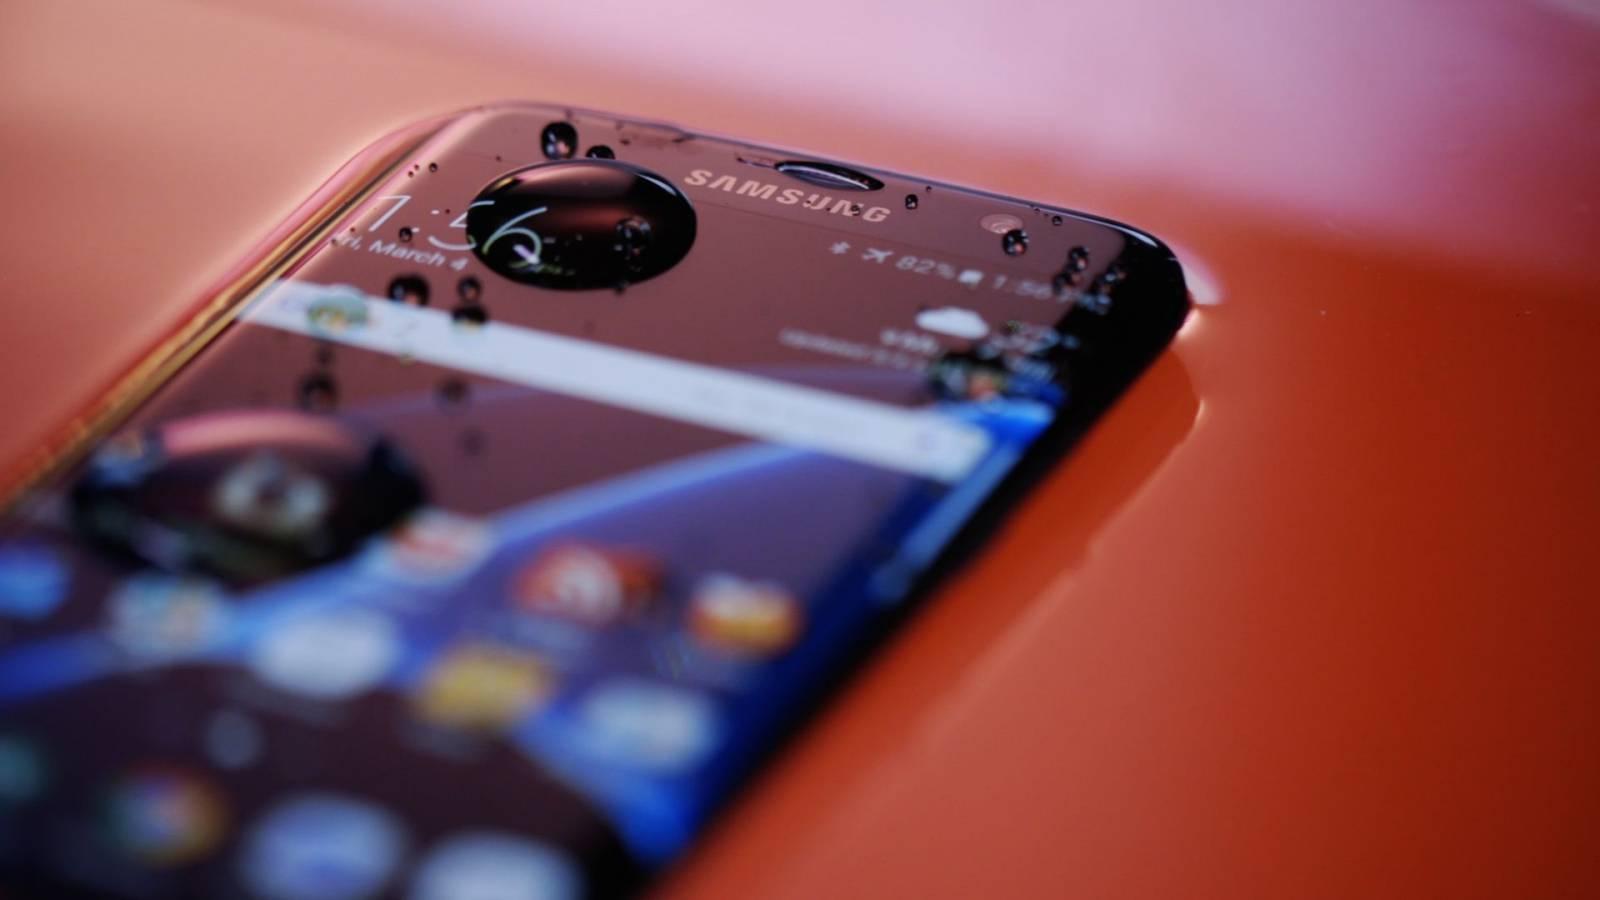 eMAG. Samsung GALAXY S7, Reduceri de 1100 LEI